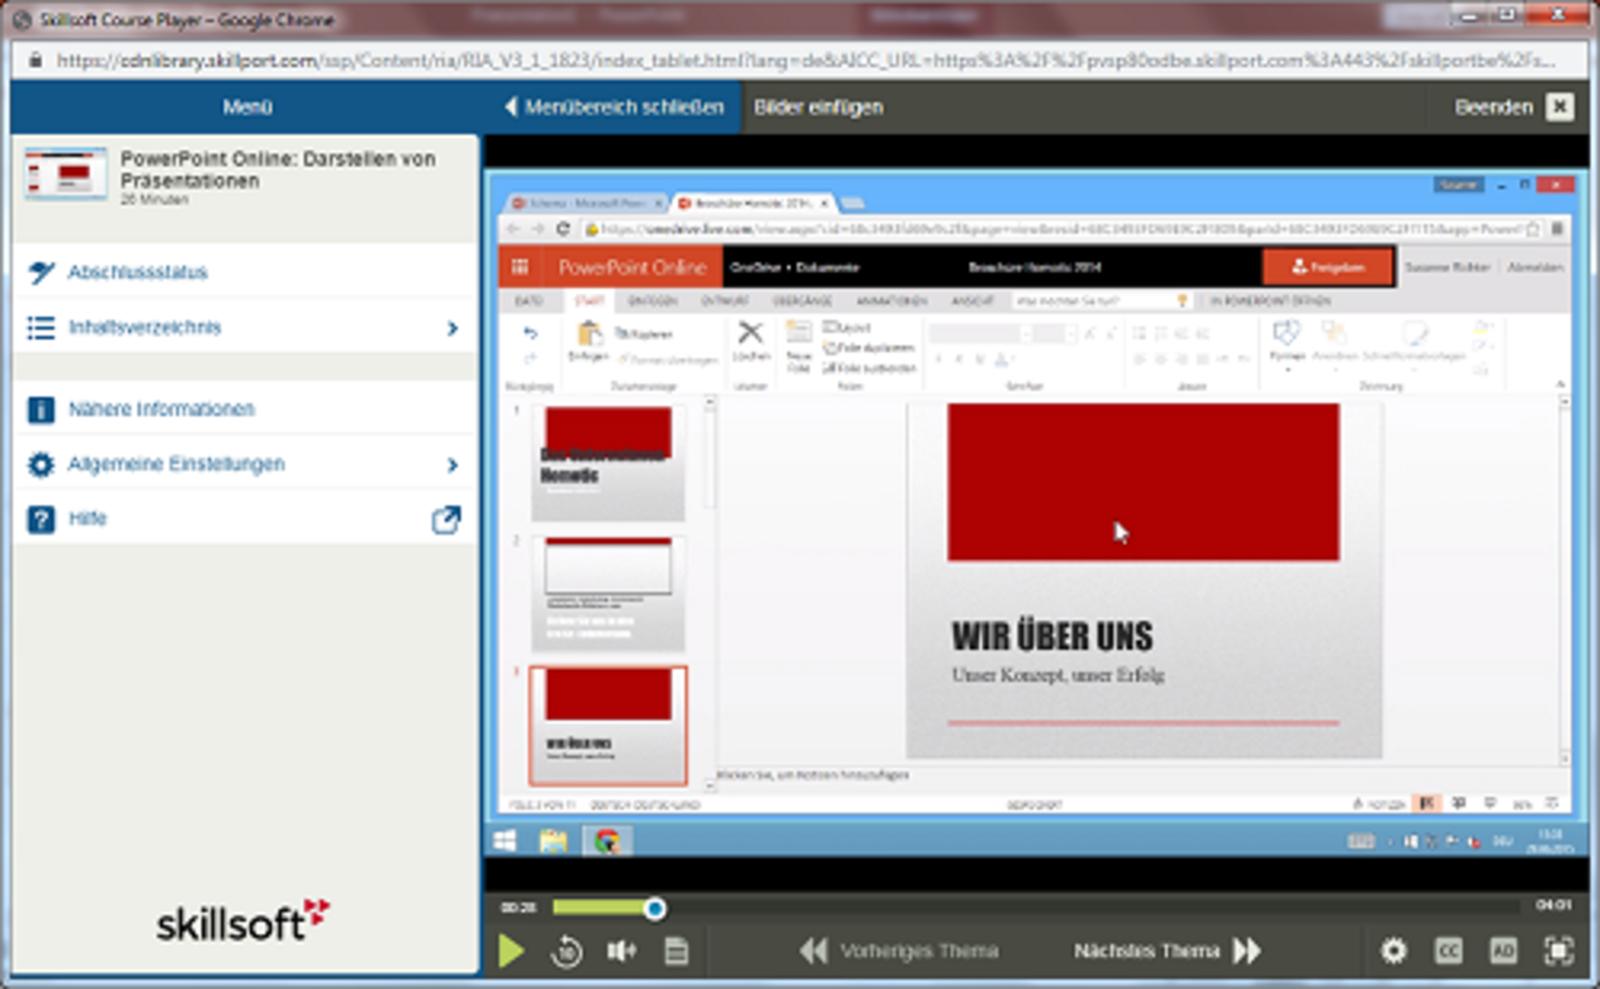 Microsoft PowerPoint PowerPoint Online E-Learning Kurs